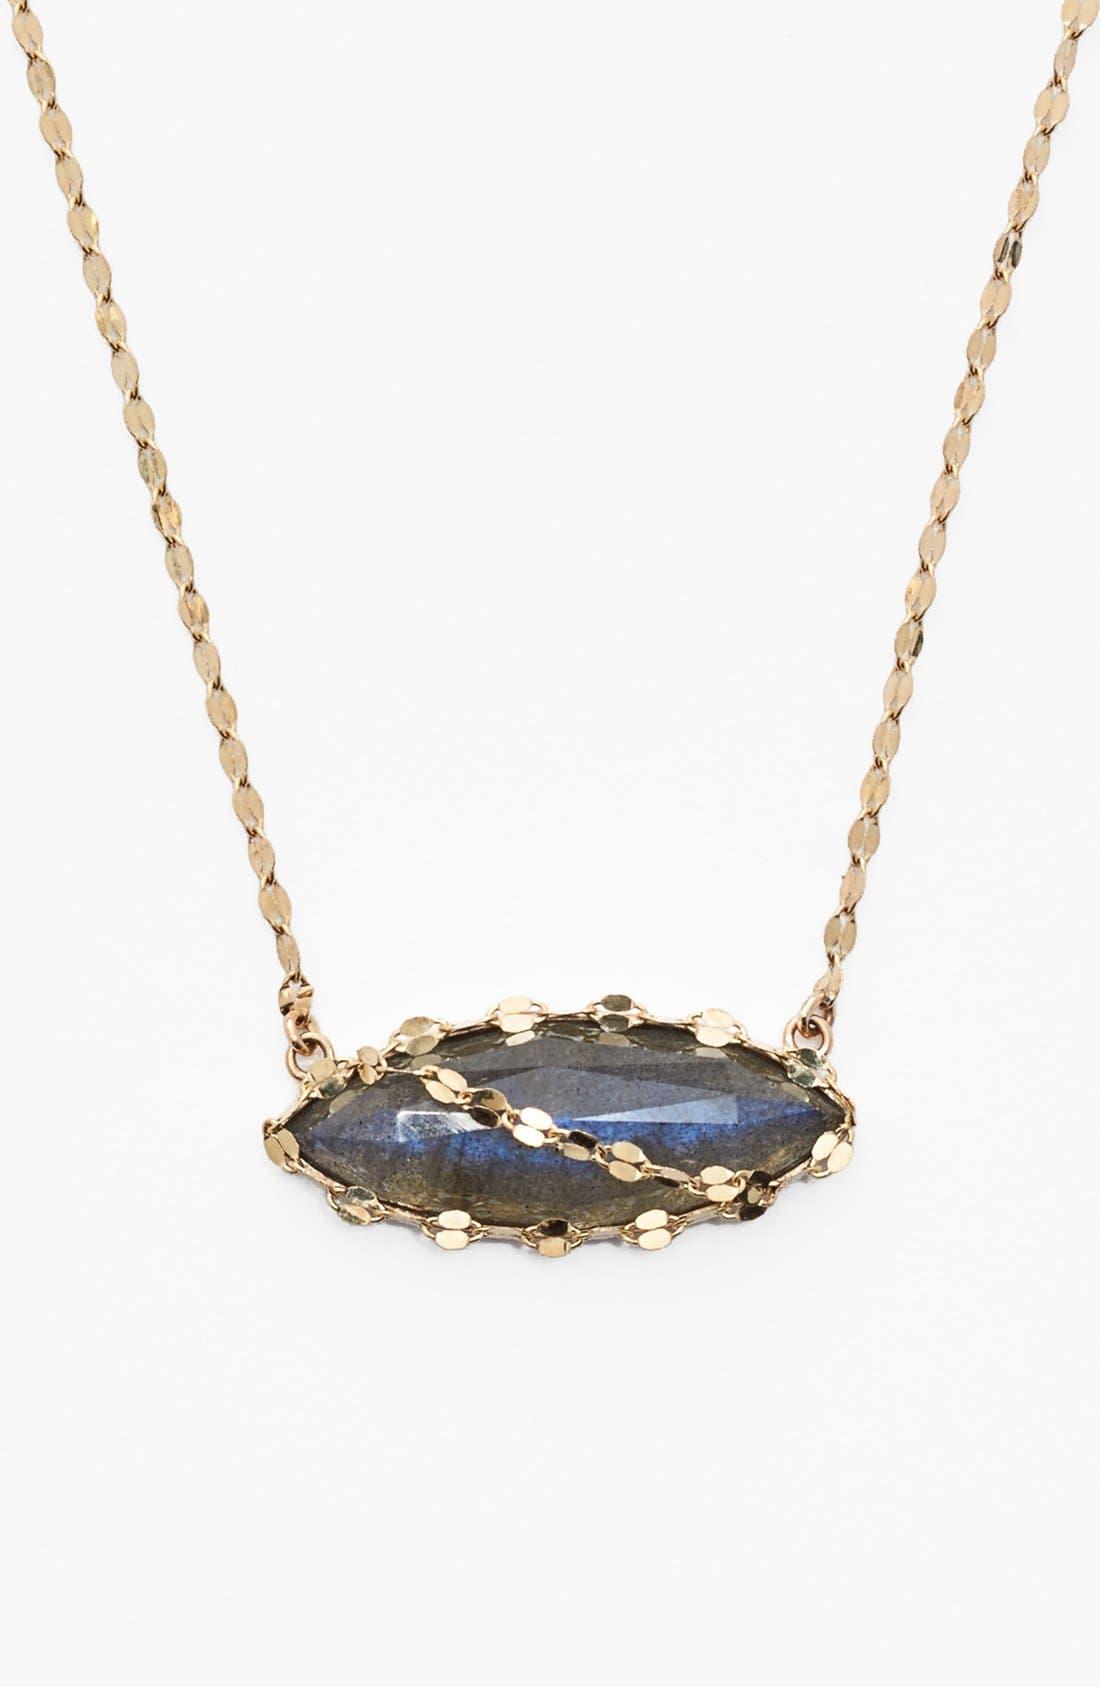 Alternate Image 1 Selected - Lana Jewelry 'Ultra' Labradorite Marquise Pendant Necklace